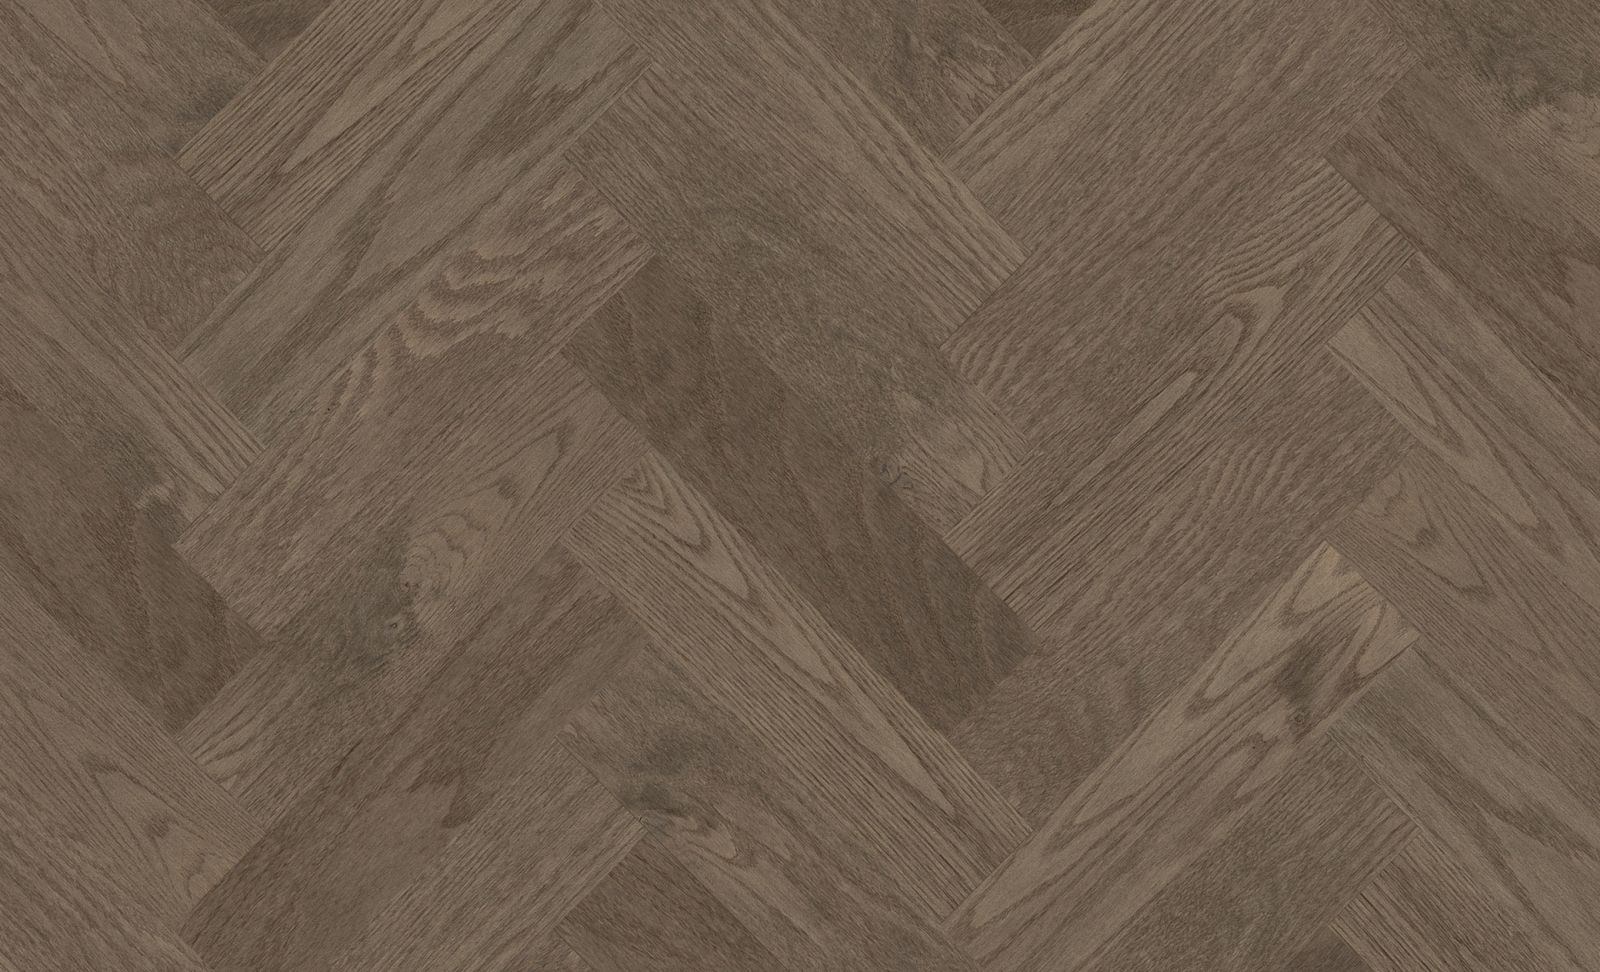 Mercier Wood Flooring Red Oak Stone RDKSTN